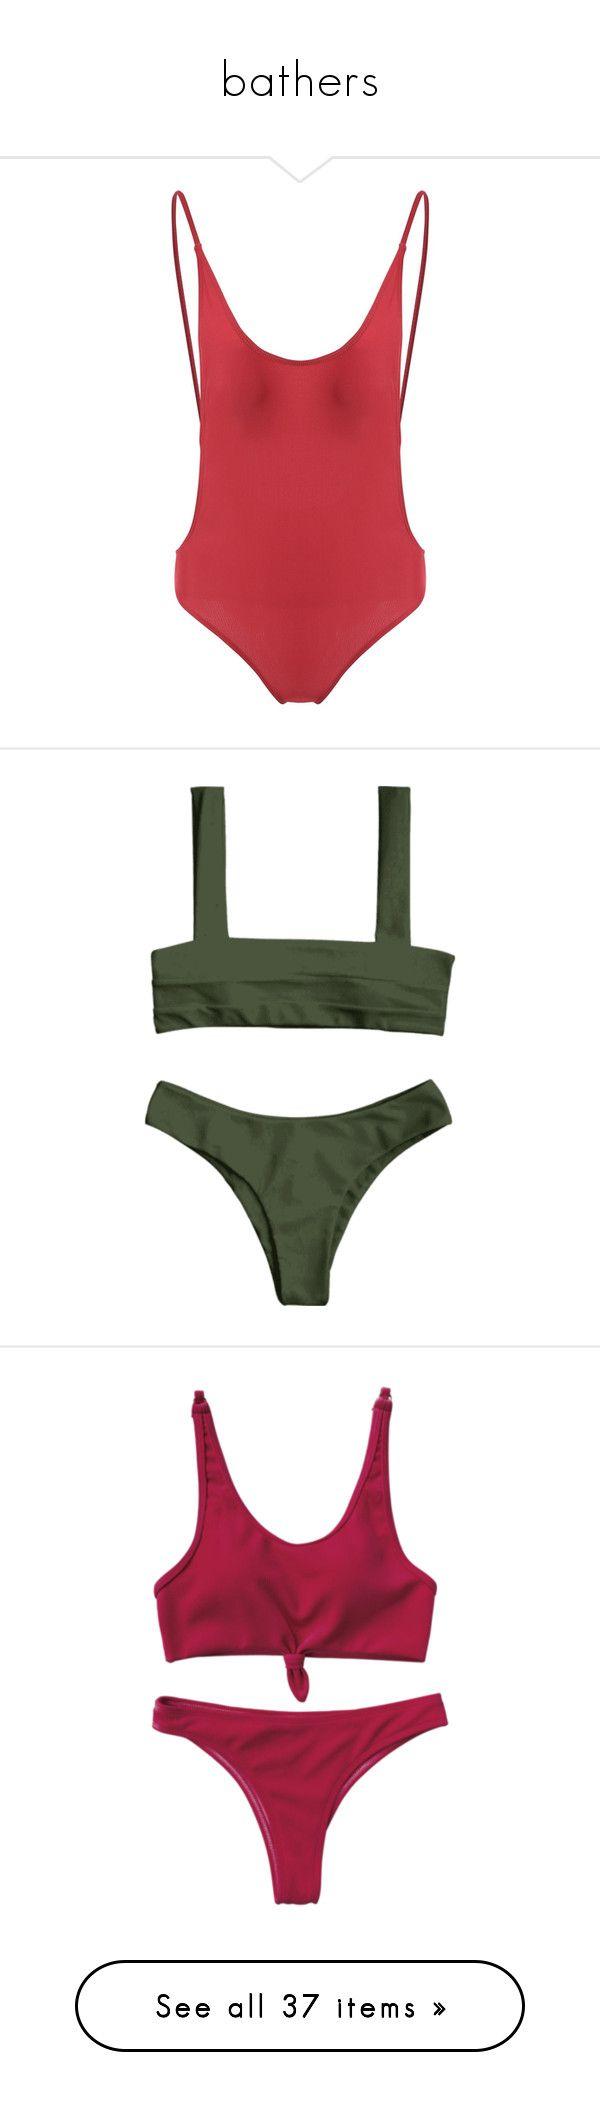 """bathers"" by tulliahfaith ❤ liked on Polyvore featuring swimwear, bikinis, bikini tops, tops, swim, swimsuits, bikini, padded bikinis, swim wear and bikini swimwear"